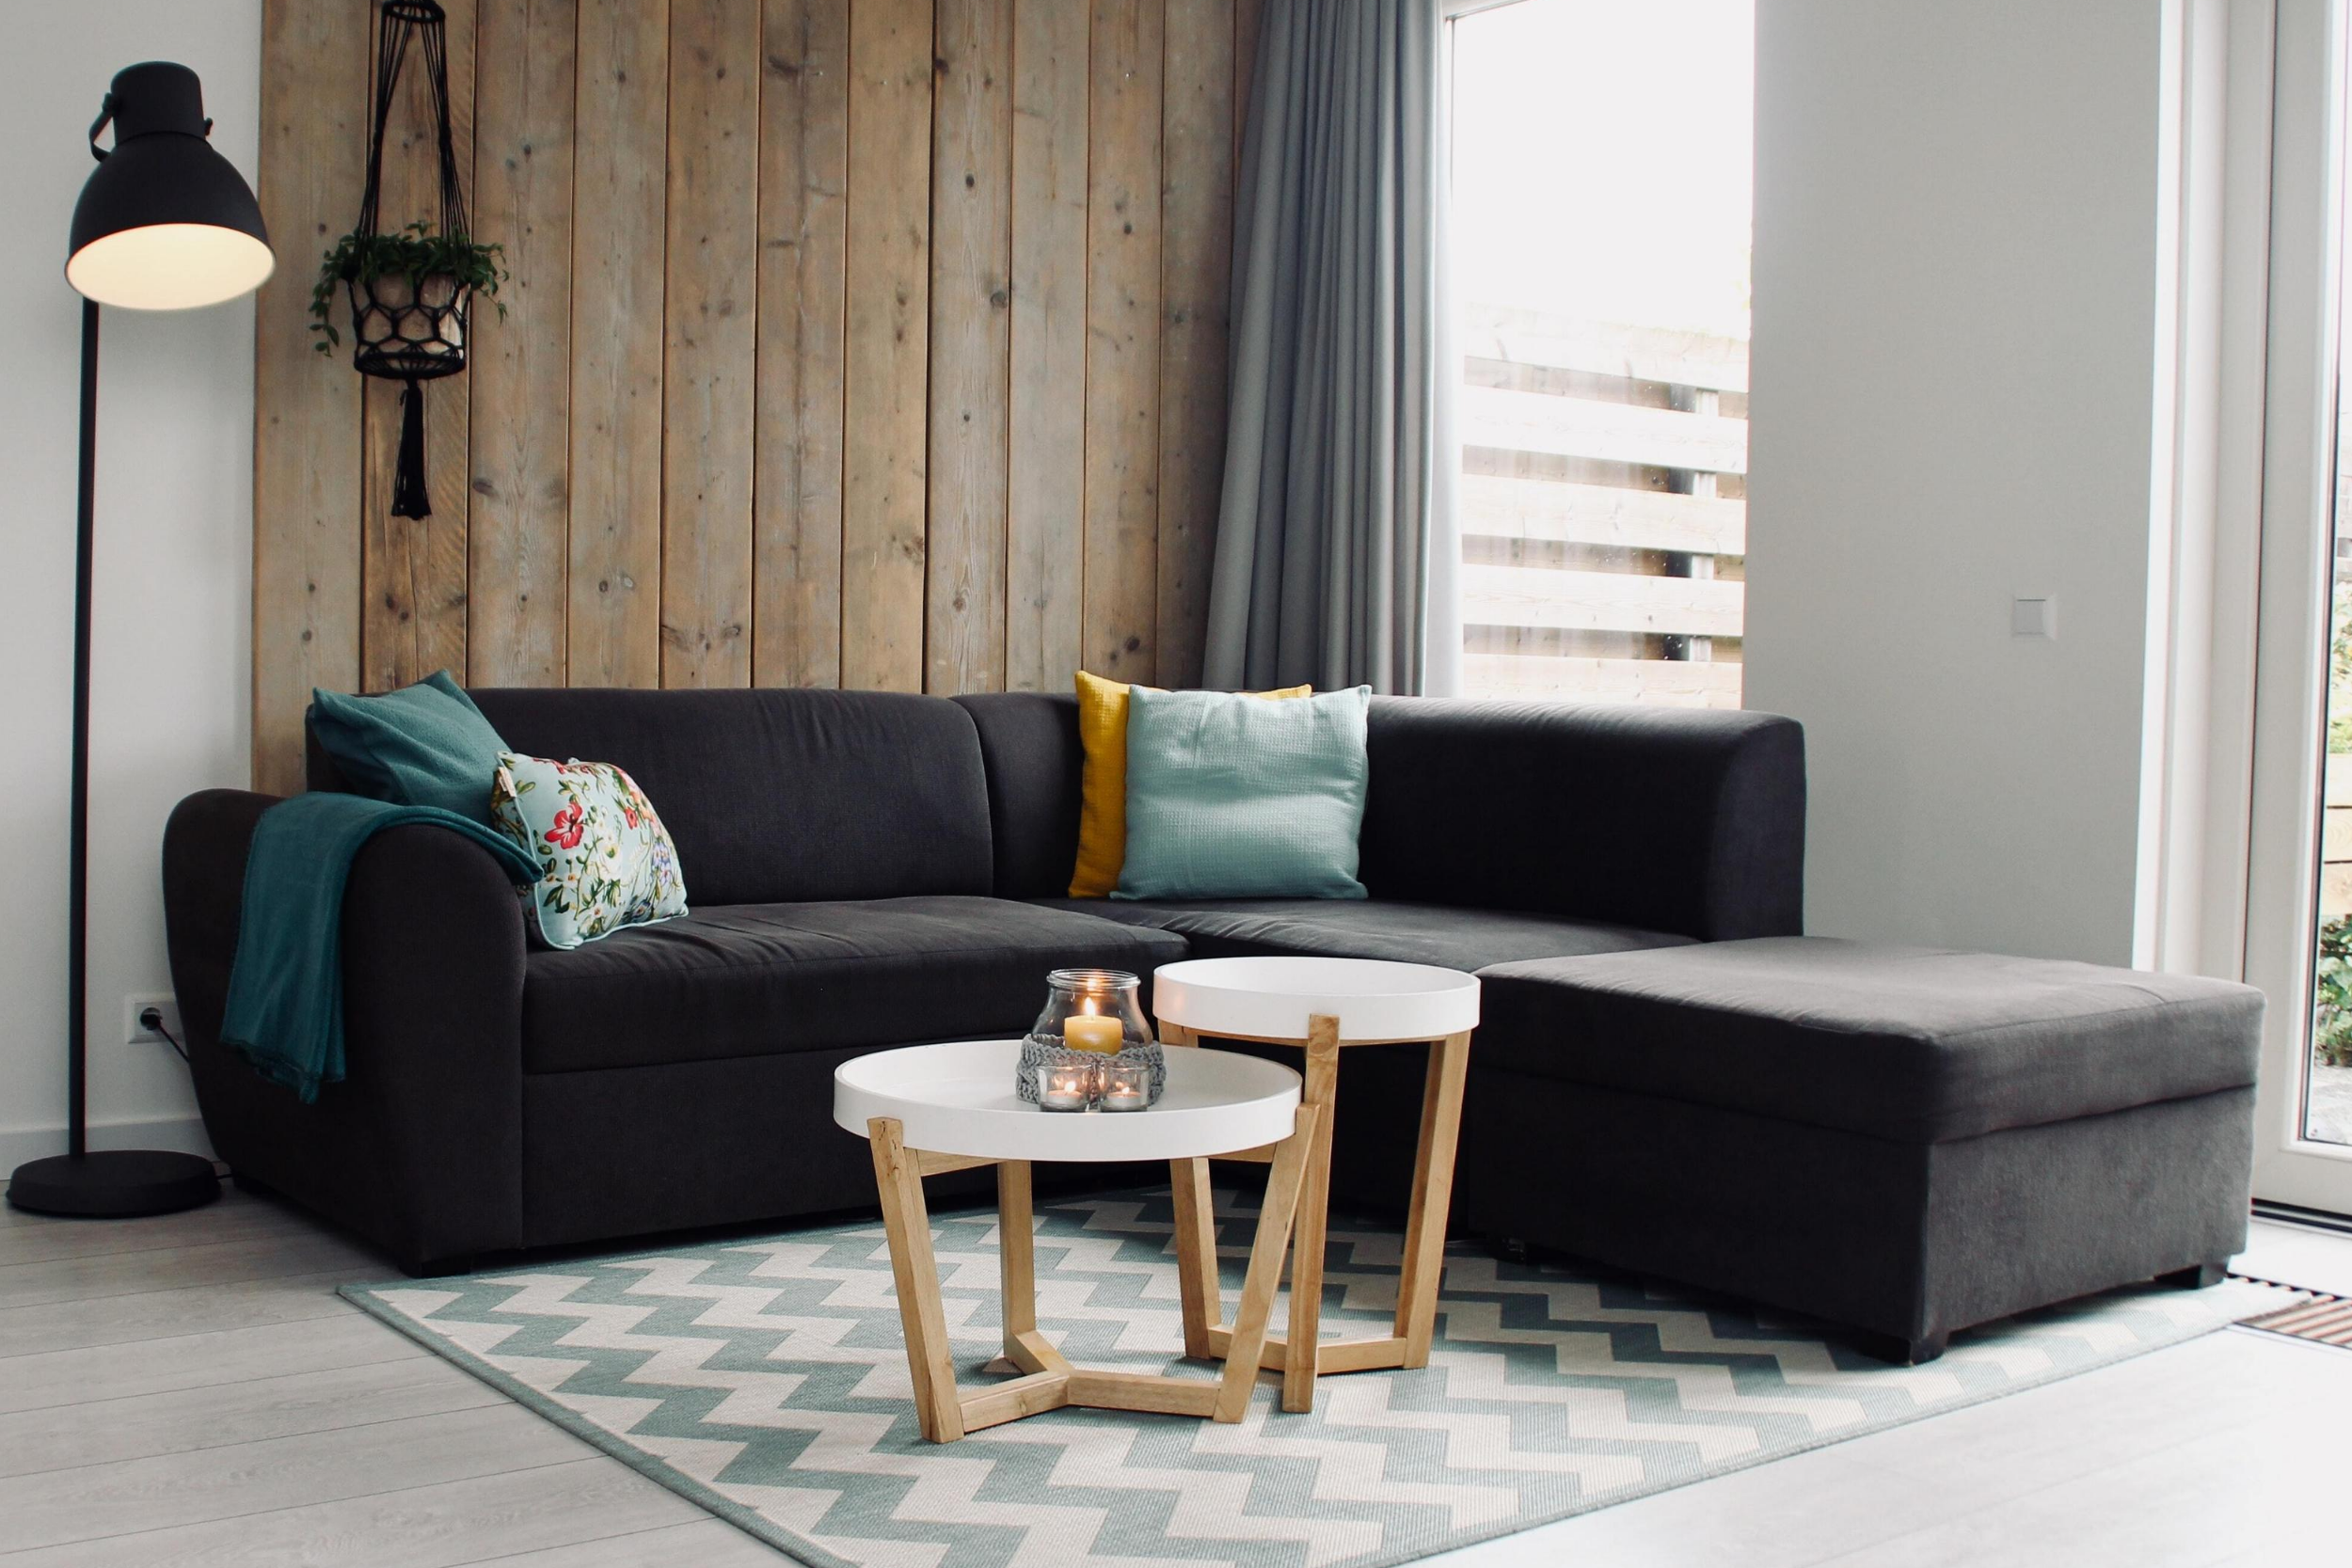 5 consejos para decorar tu apartamento vacacional